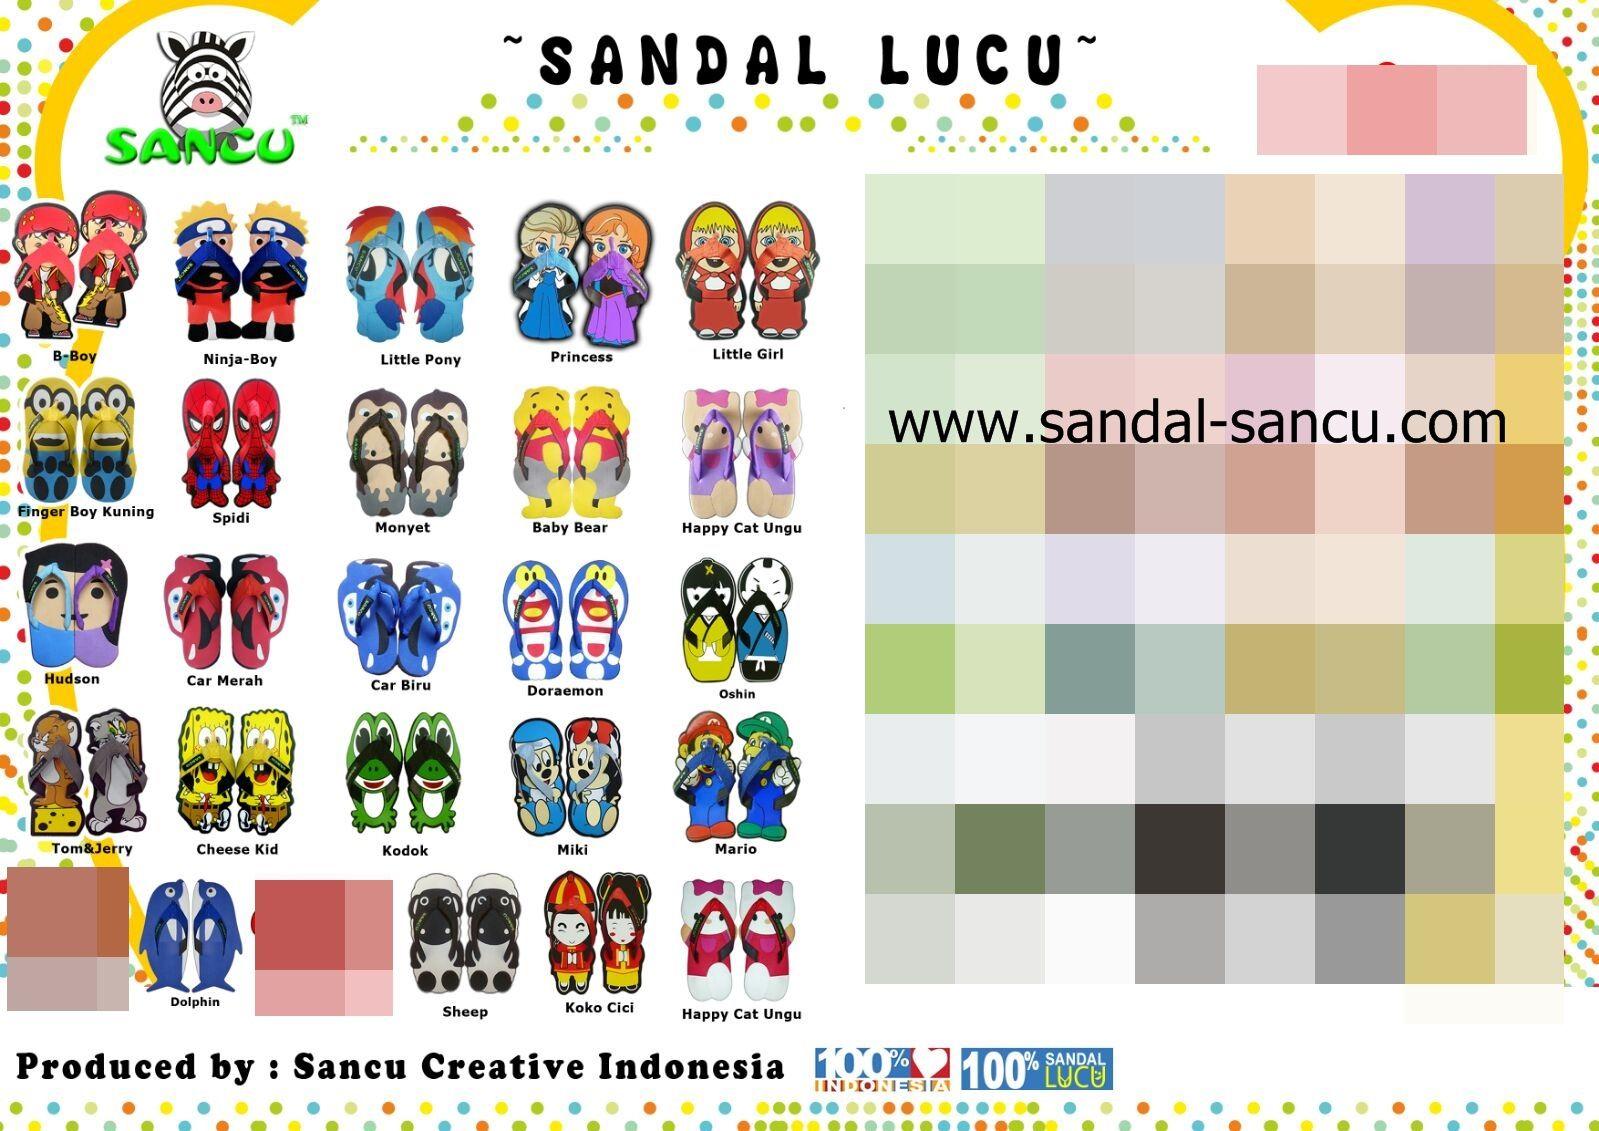 Jual Grosir Sandal Sancu 21,24 - Grosir Pabrik Sancu | Tokopedia